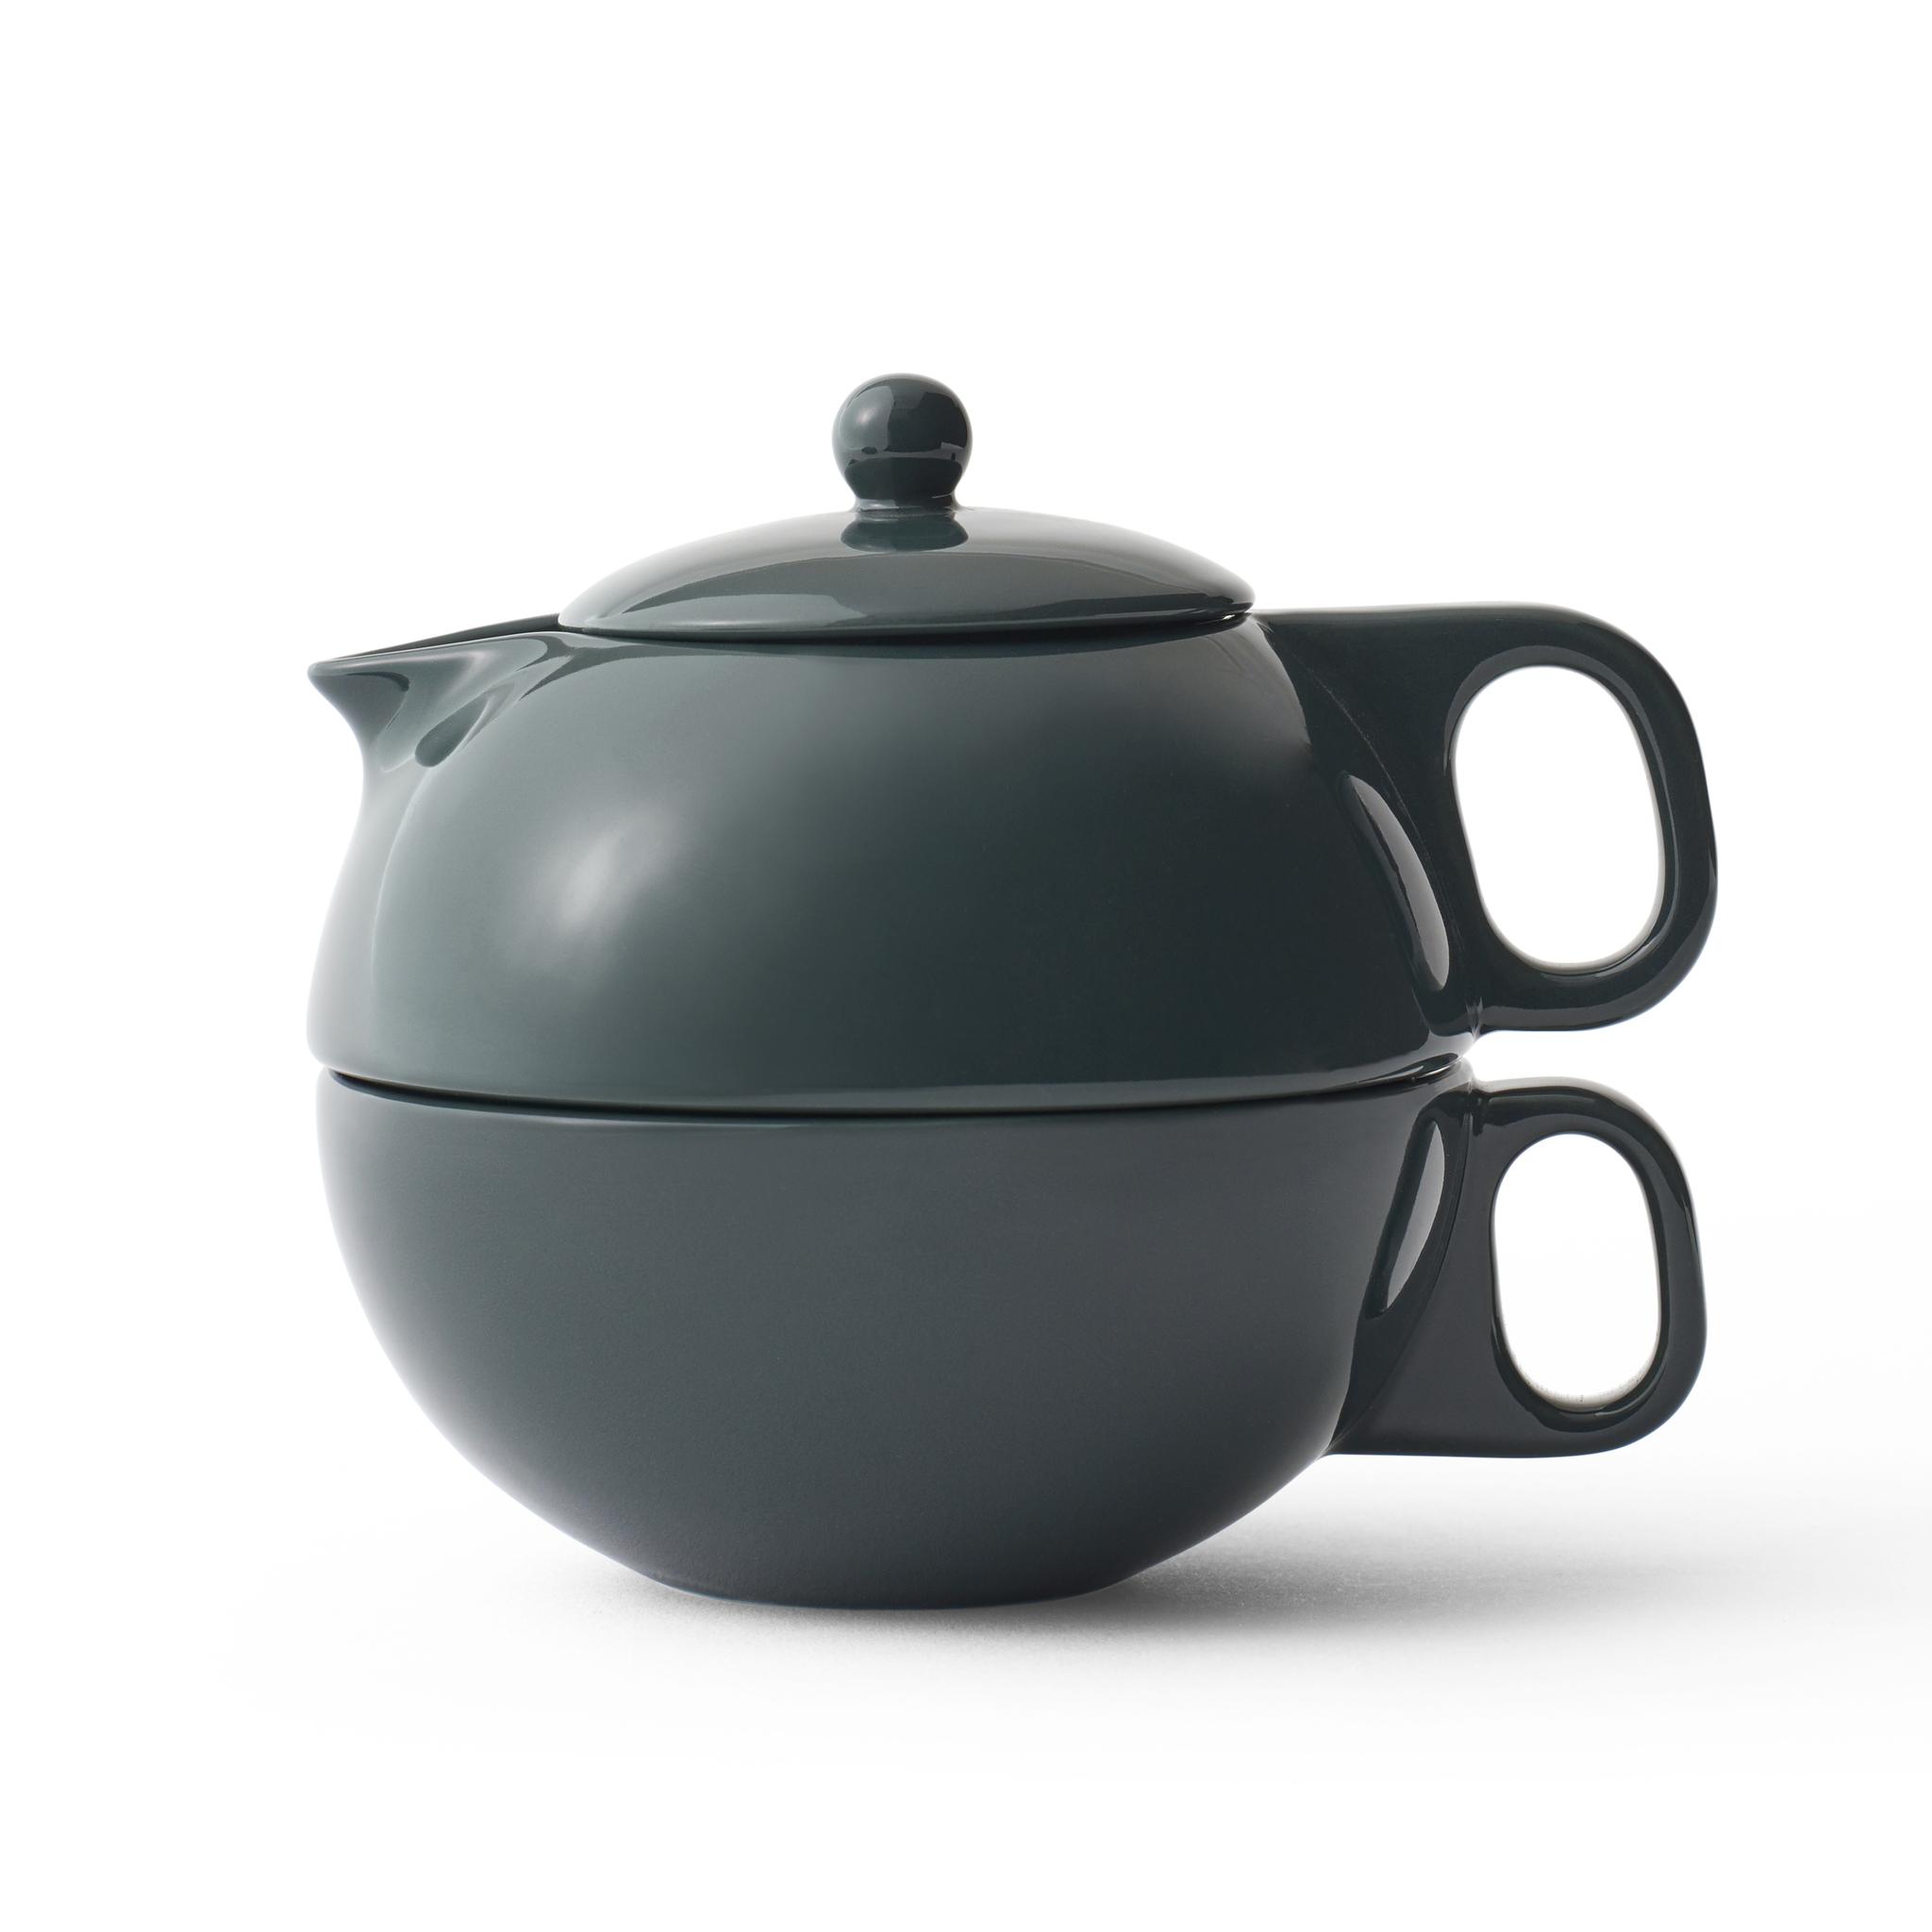 "Чайный набор на одну персону Viva Scandinavia ""Jaimi"" 300 мл"